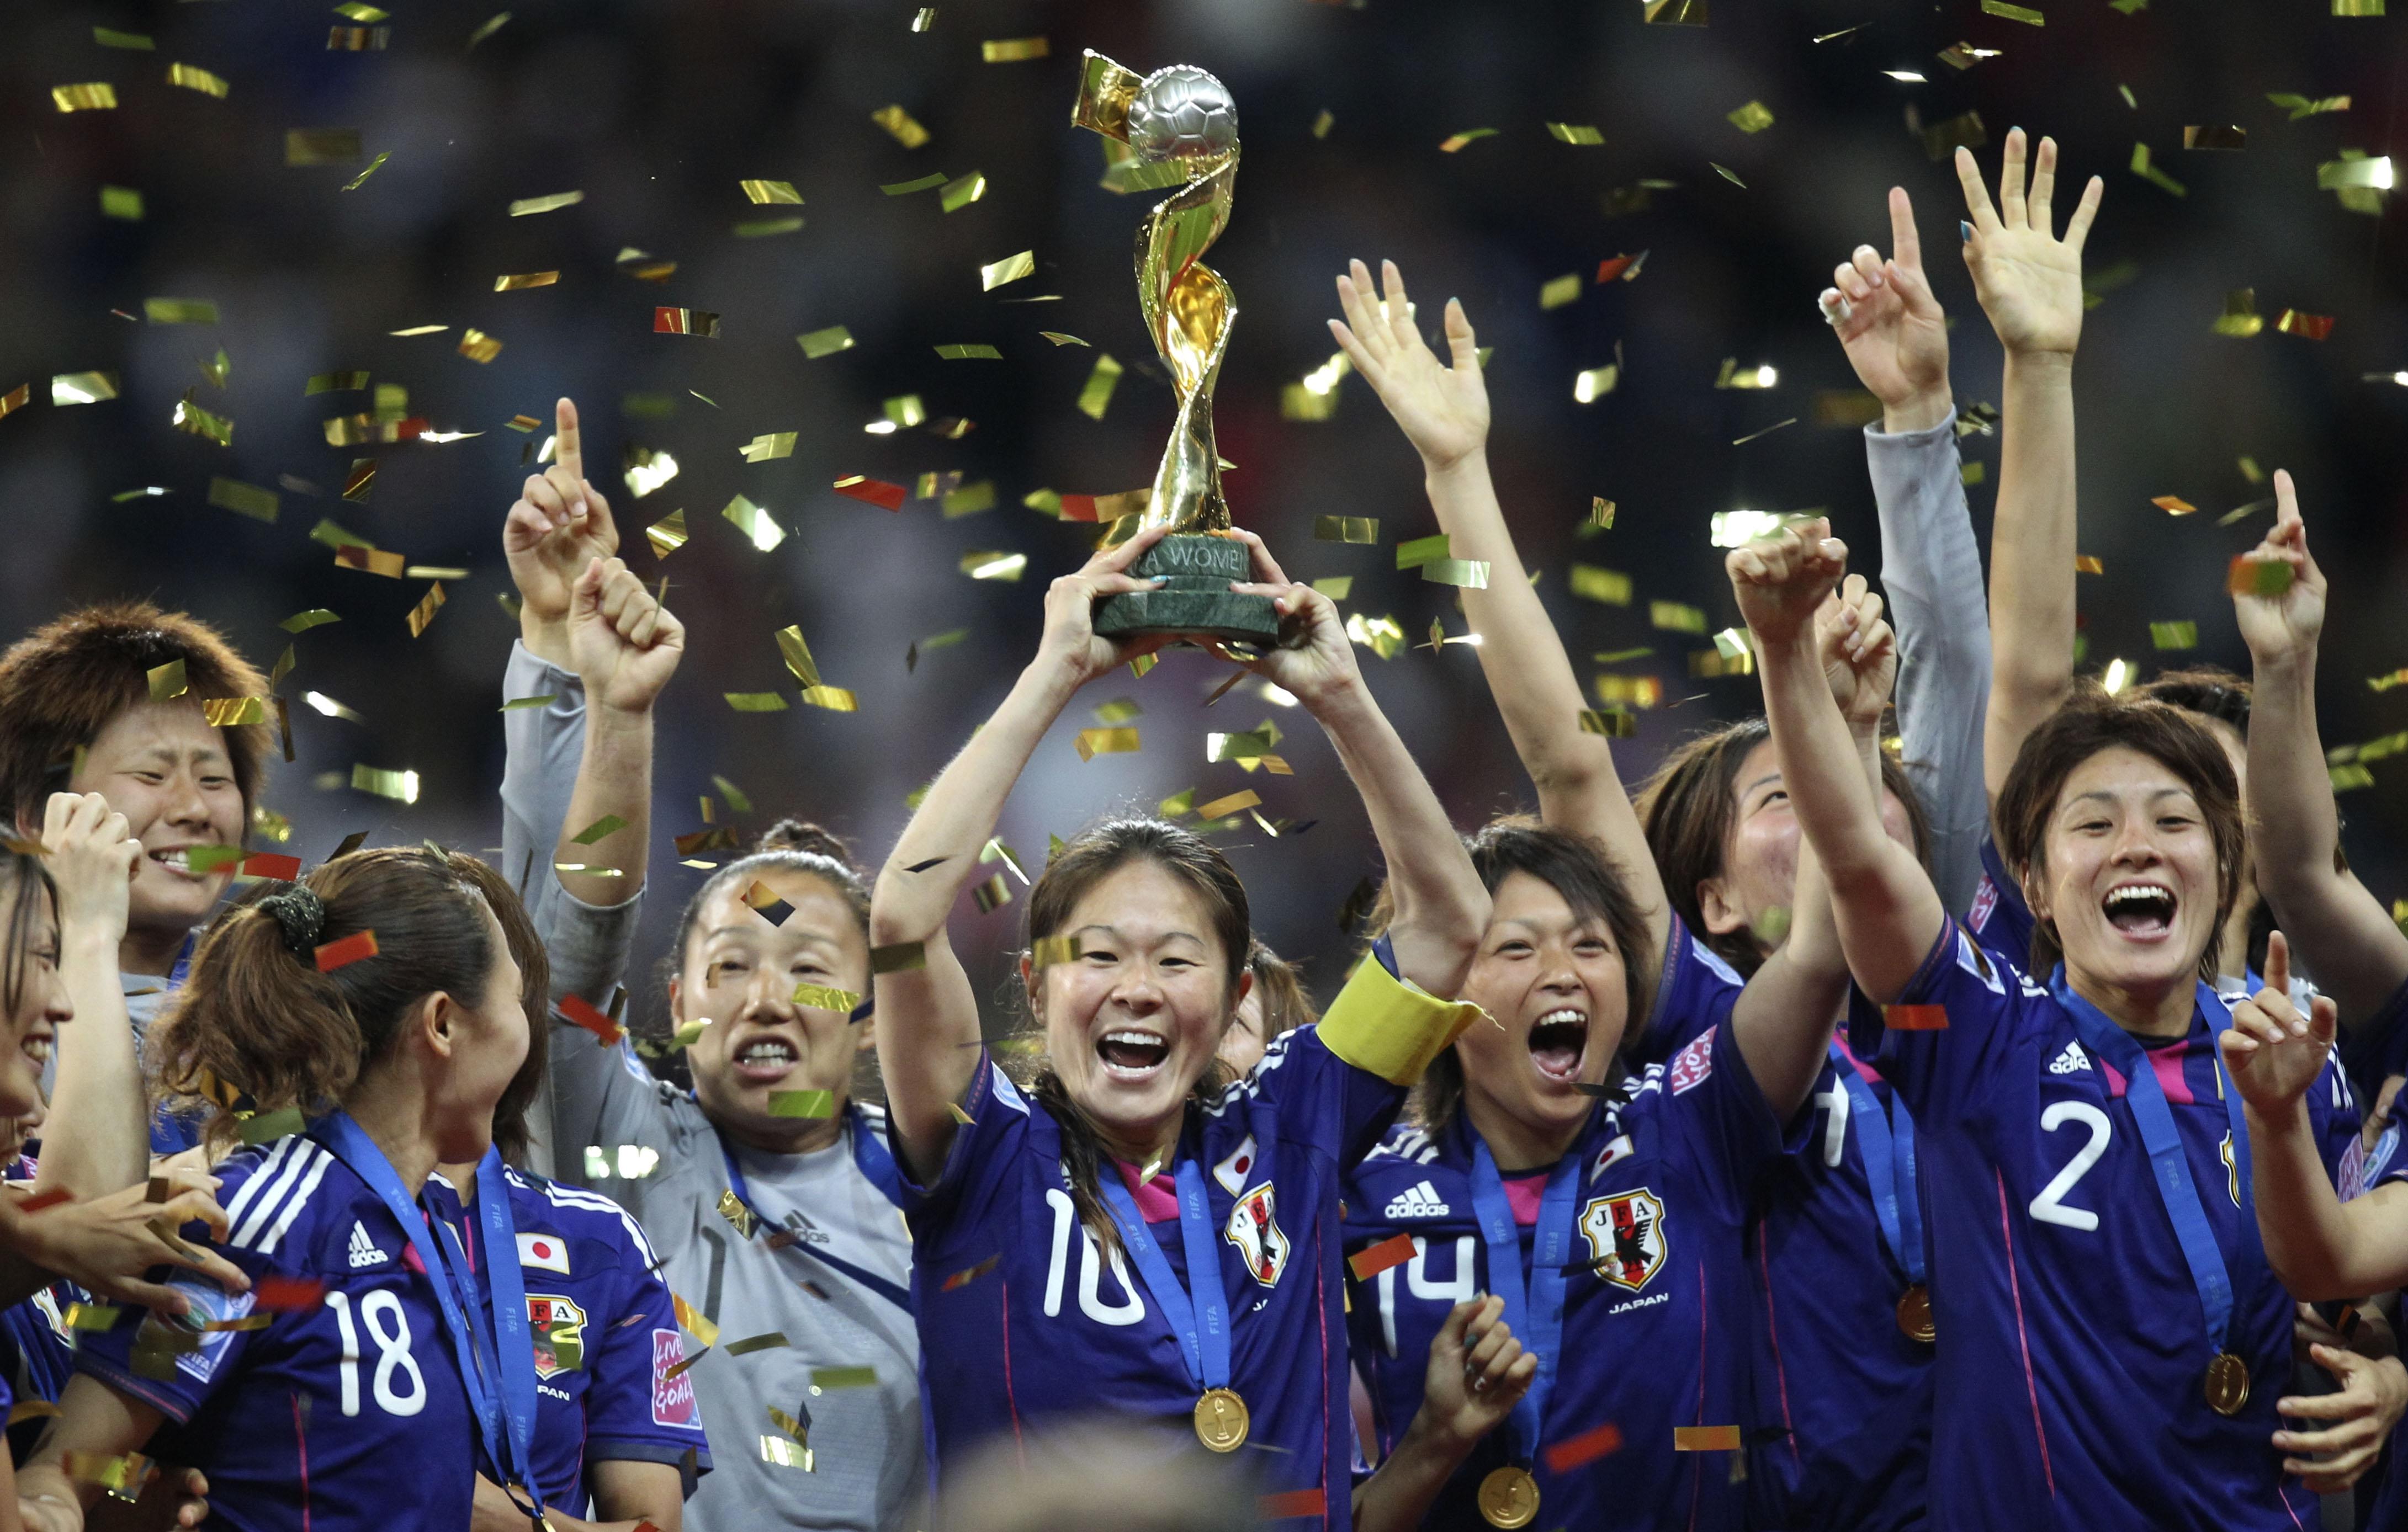 2011 Japan women's team